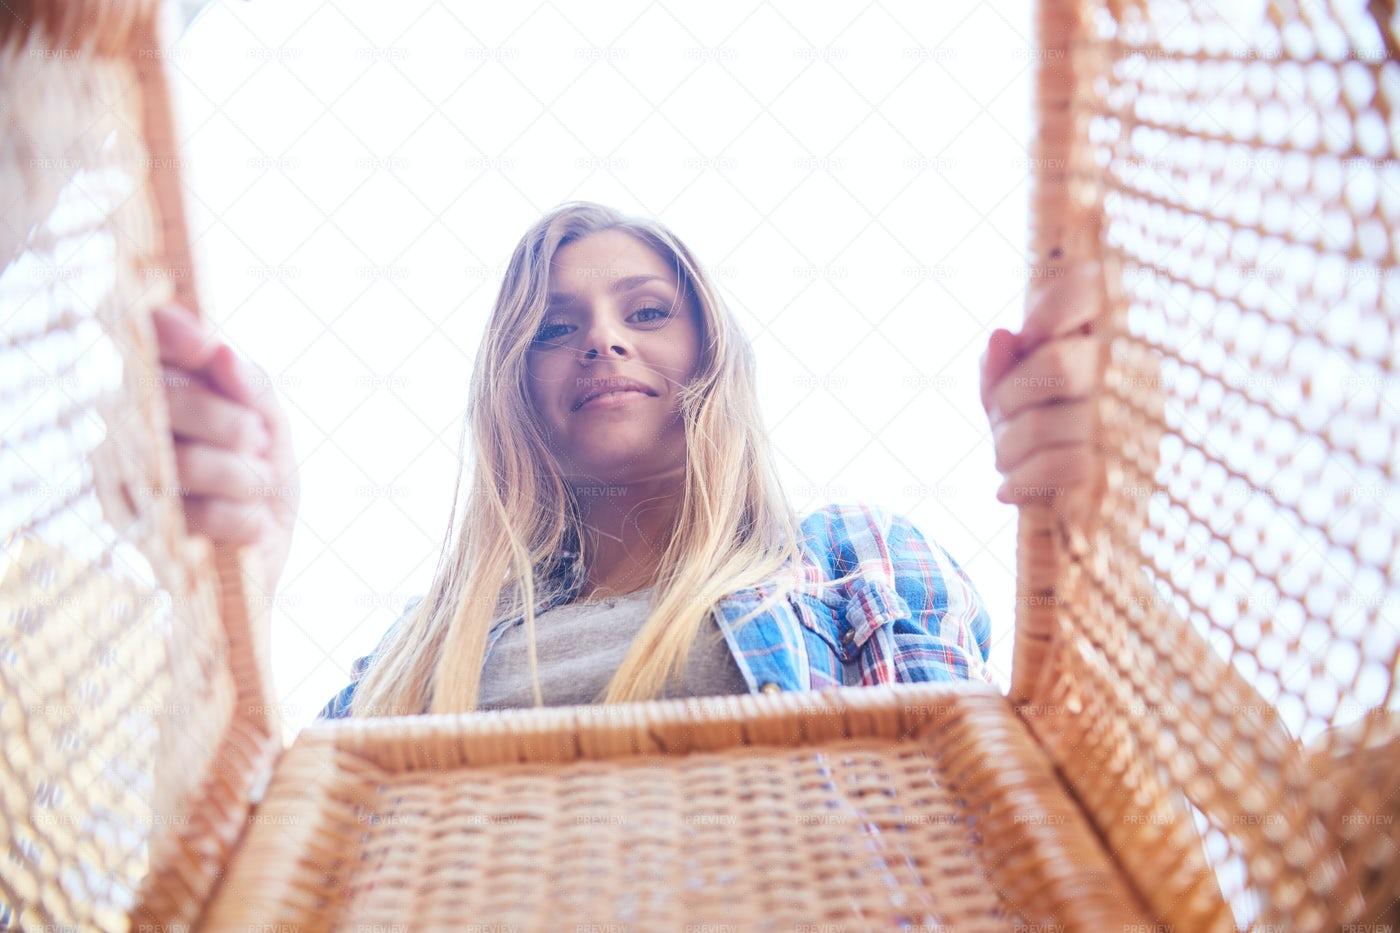 Smiling Woman Holding Basket: Stock Photos